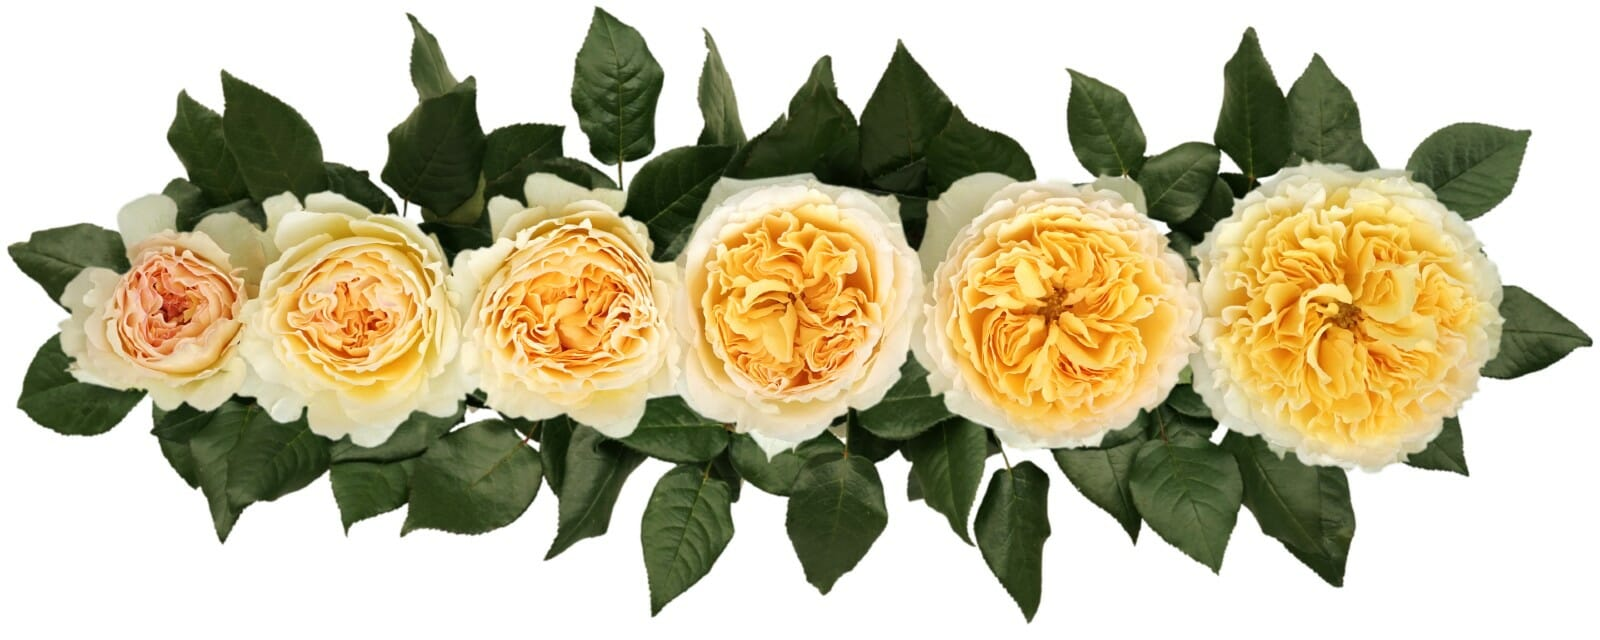 David Austin BEATRICE (AUSLEVITY) Roses Point of Cut